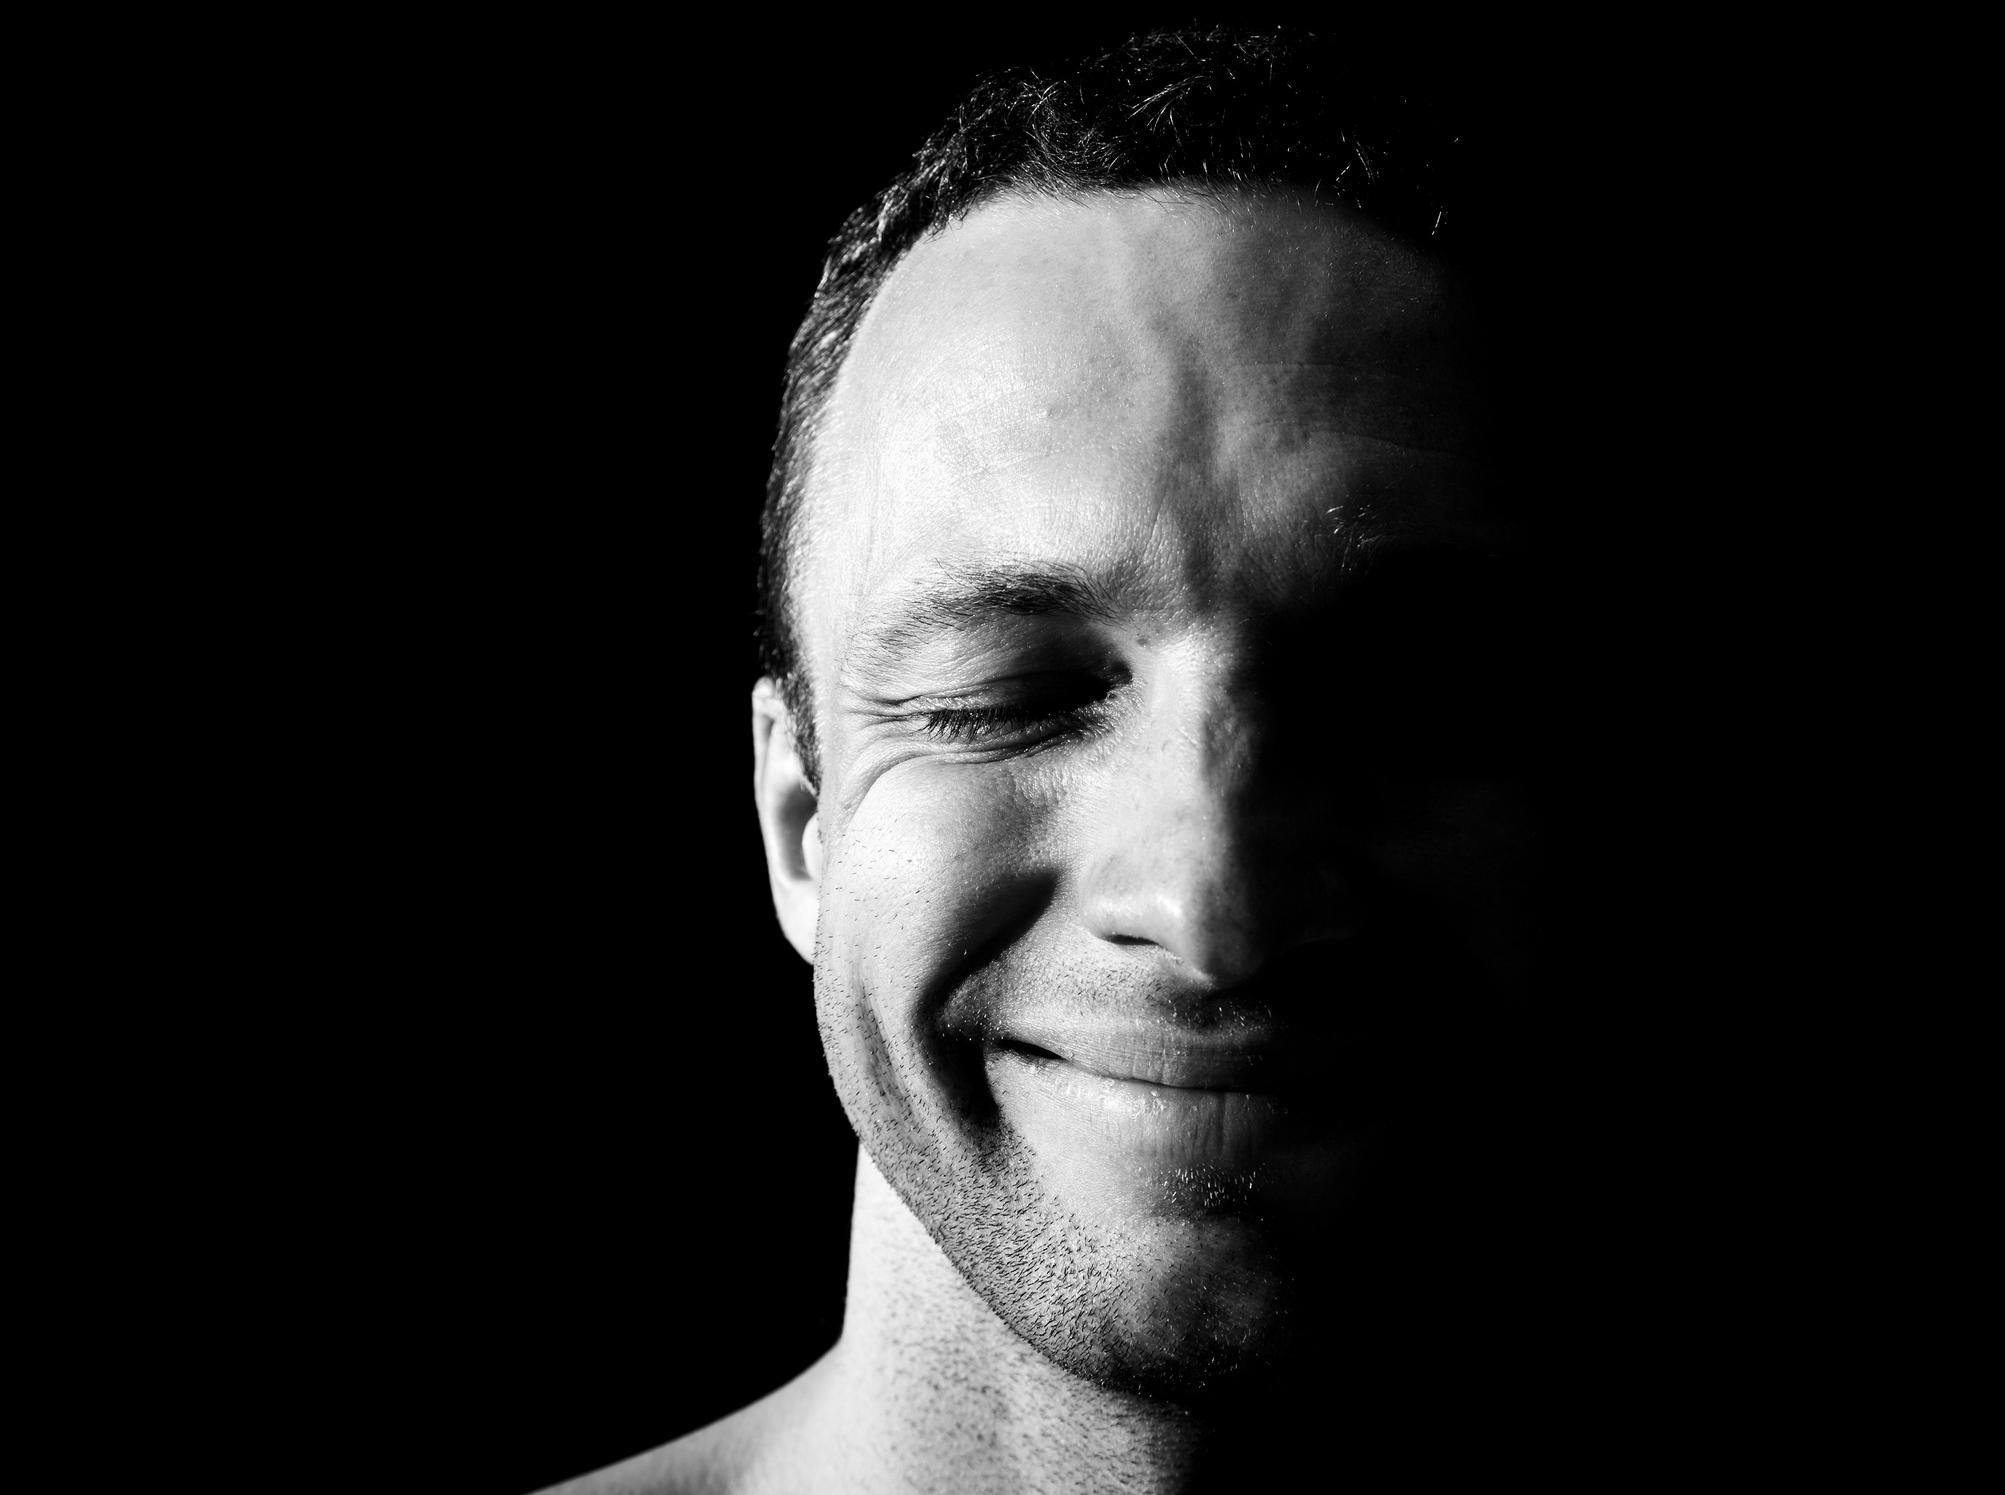 iStock-498009609 - man smiling L.jpg